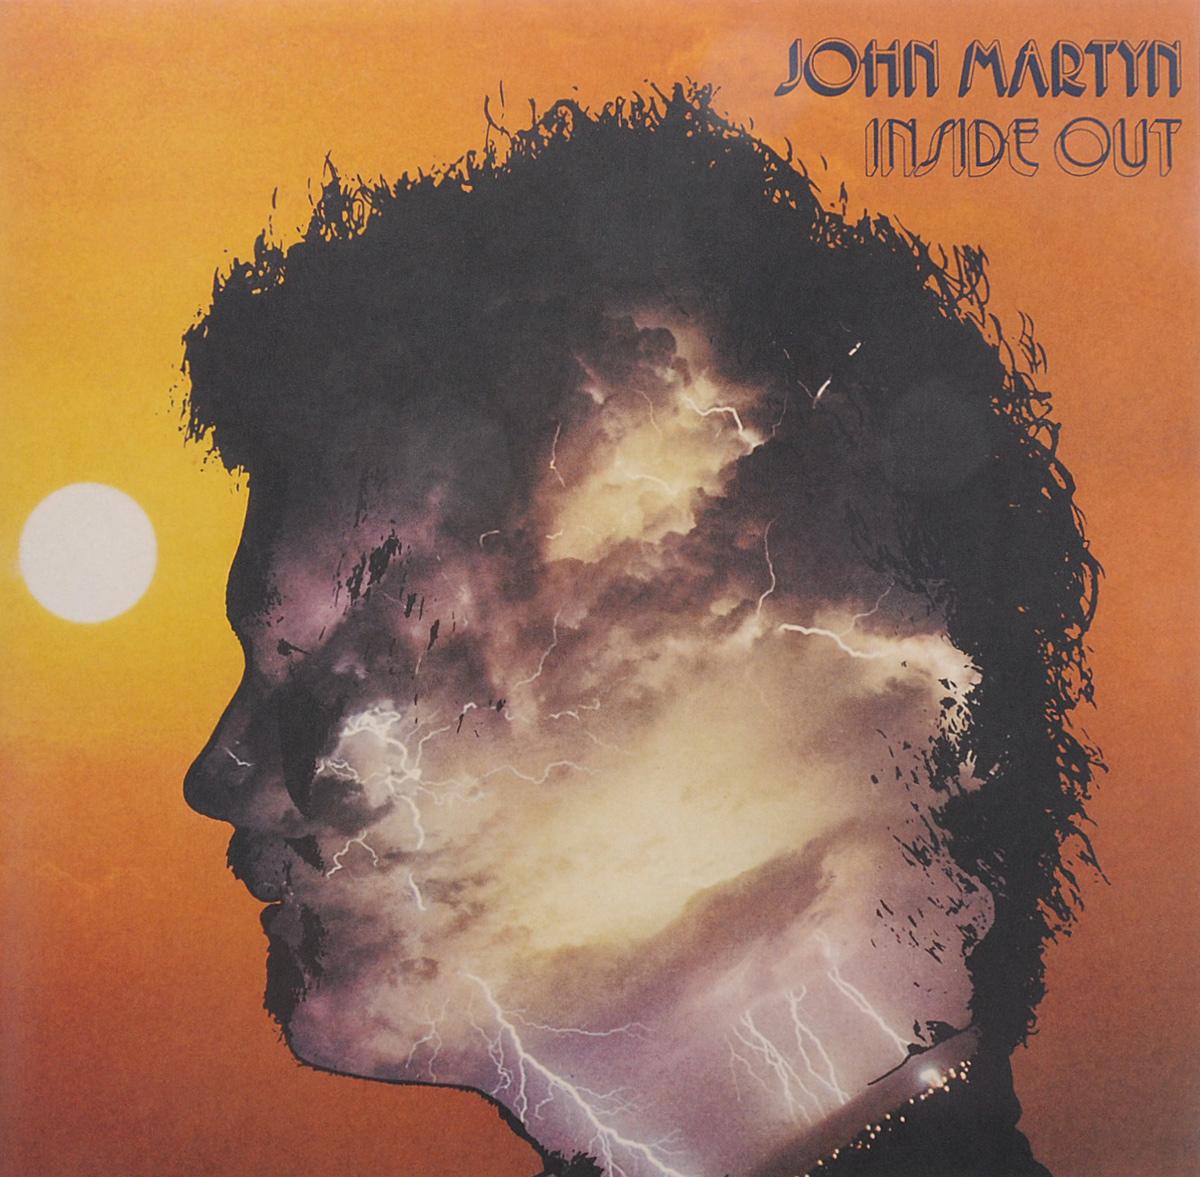 Джон Мартин John Martyn. Inside Out (LP) джон мартин john martyn sapphire 2 lp